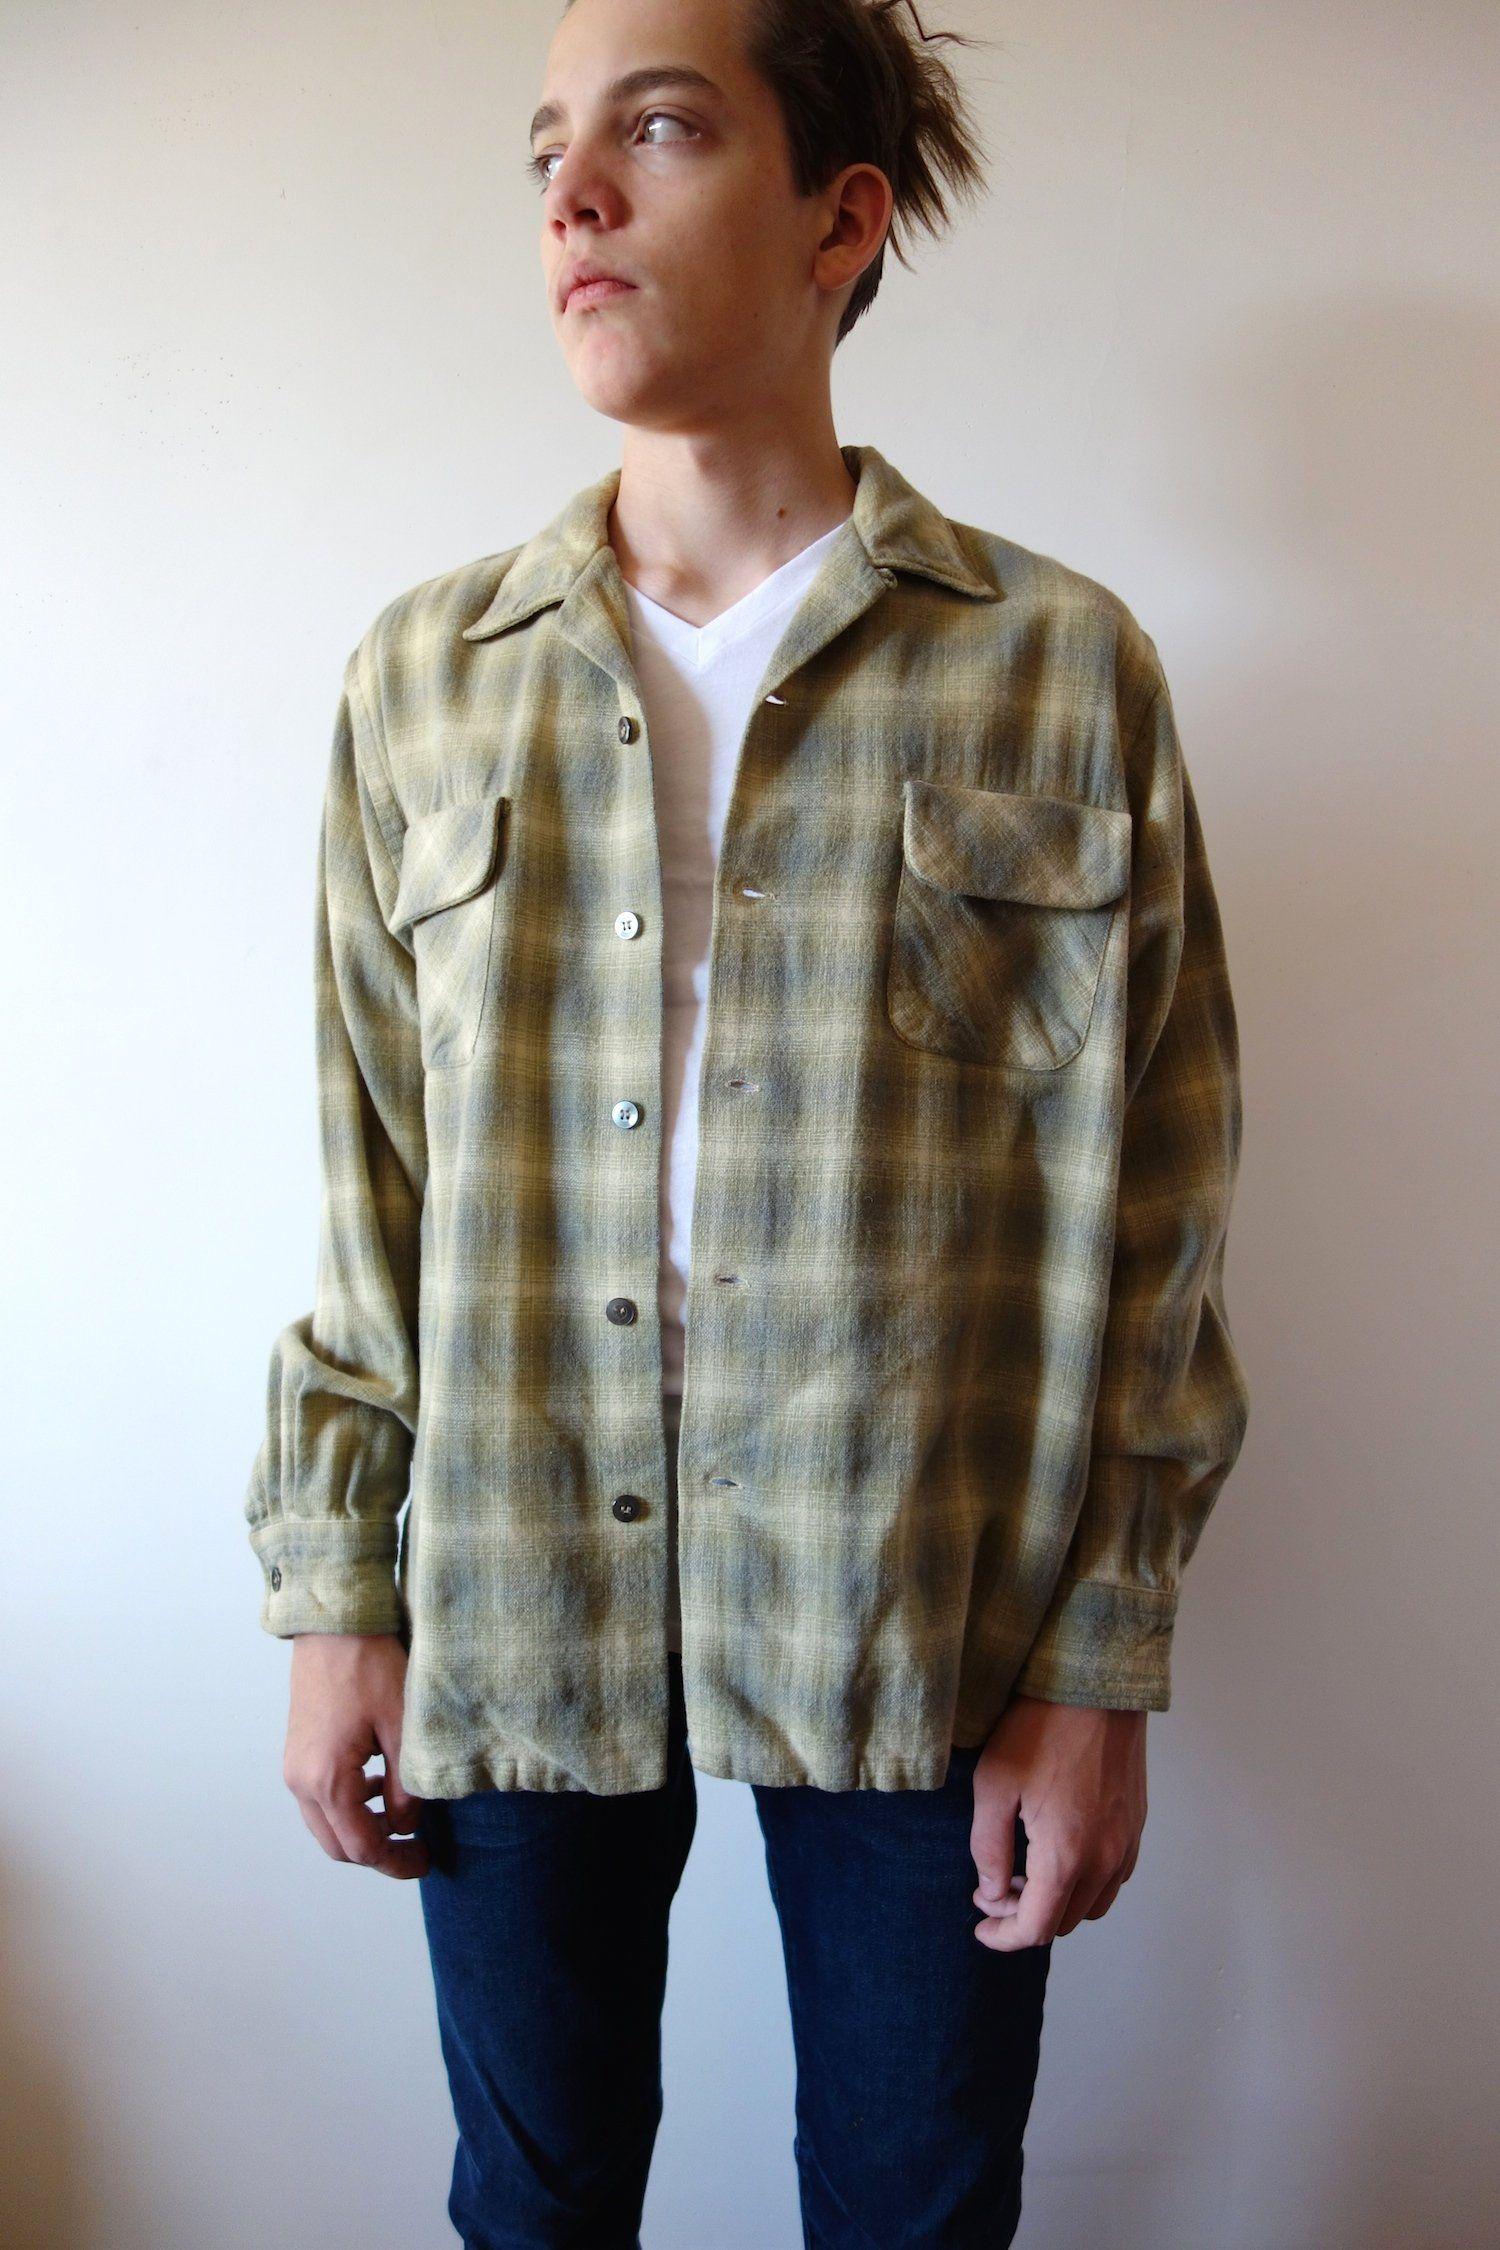 Pin On Vintage Menswear